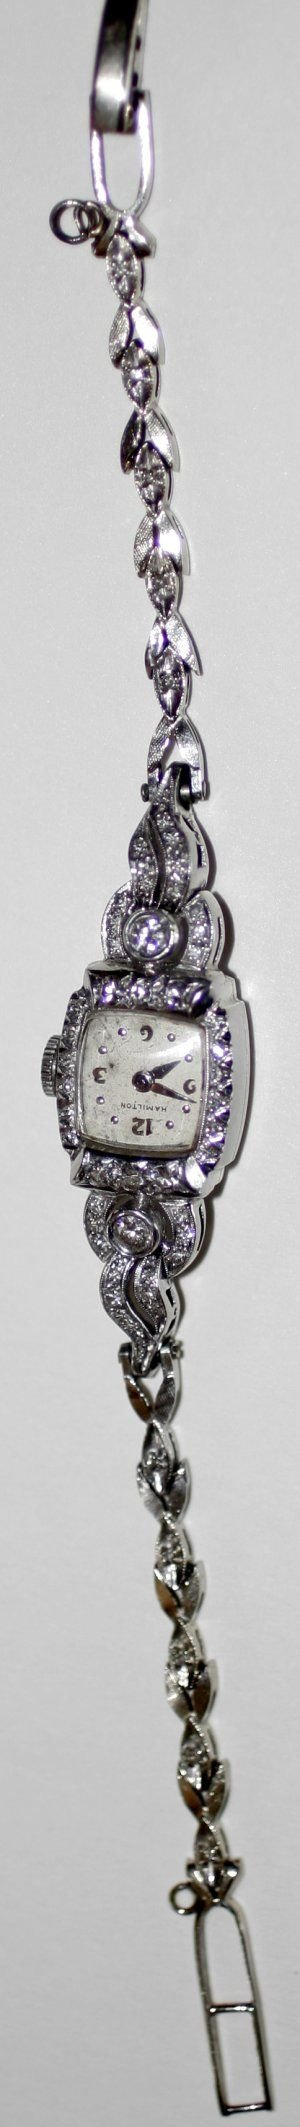 090992: HAMILTON PLATINUM & DIAMOND WRIST WATCH